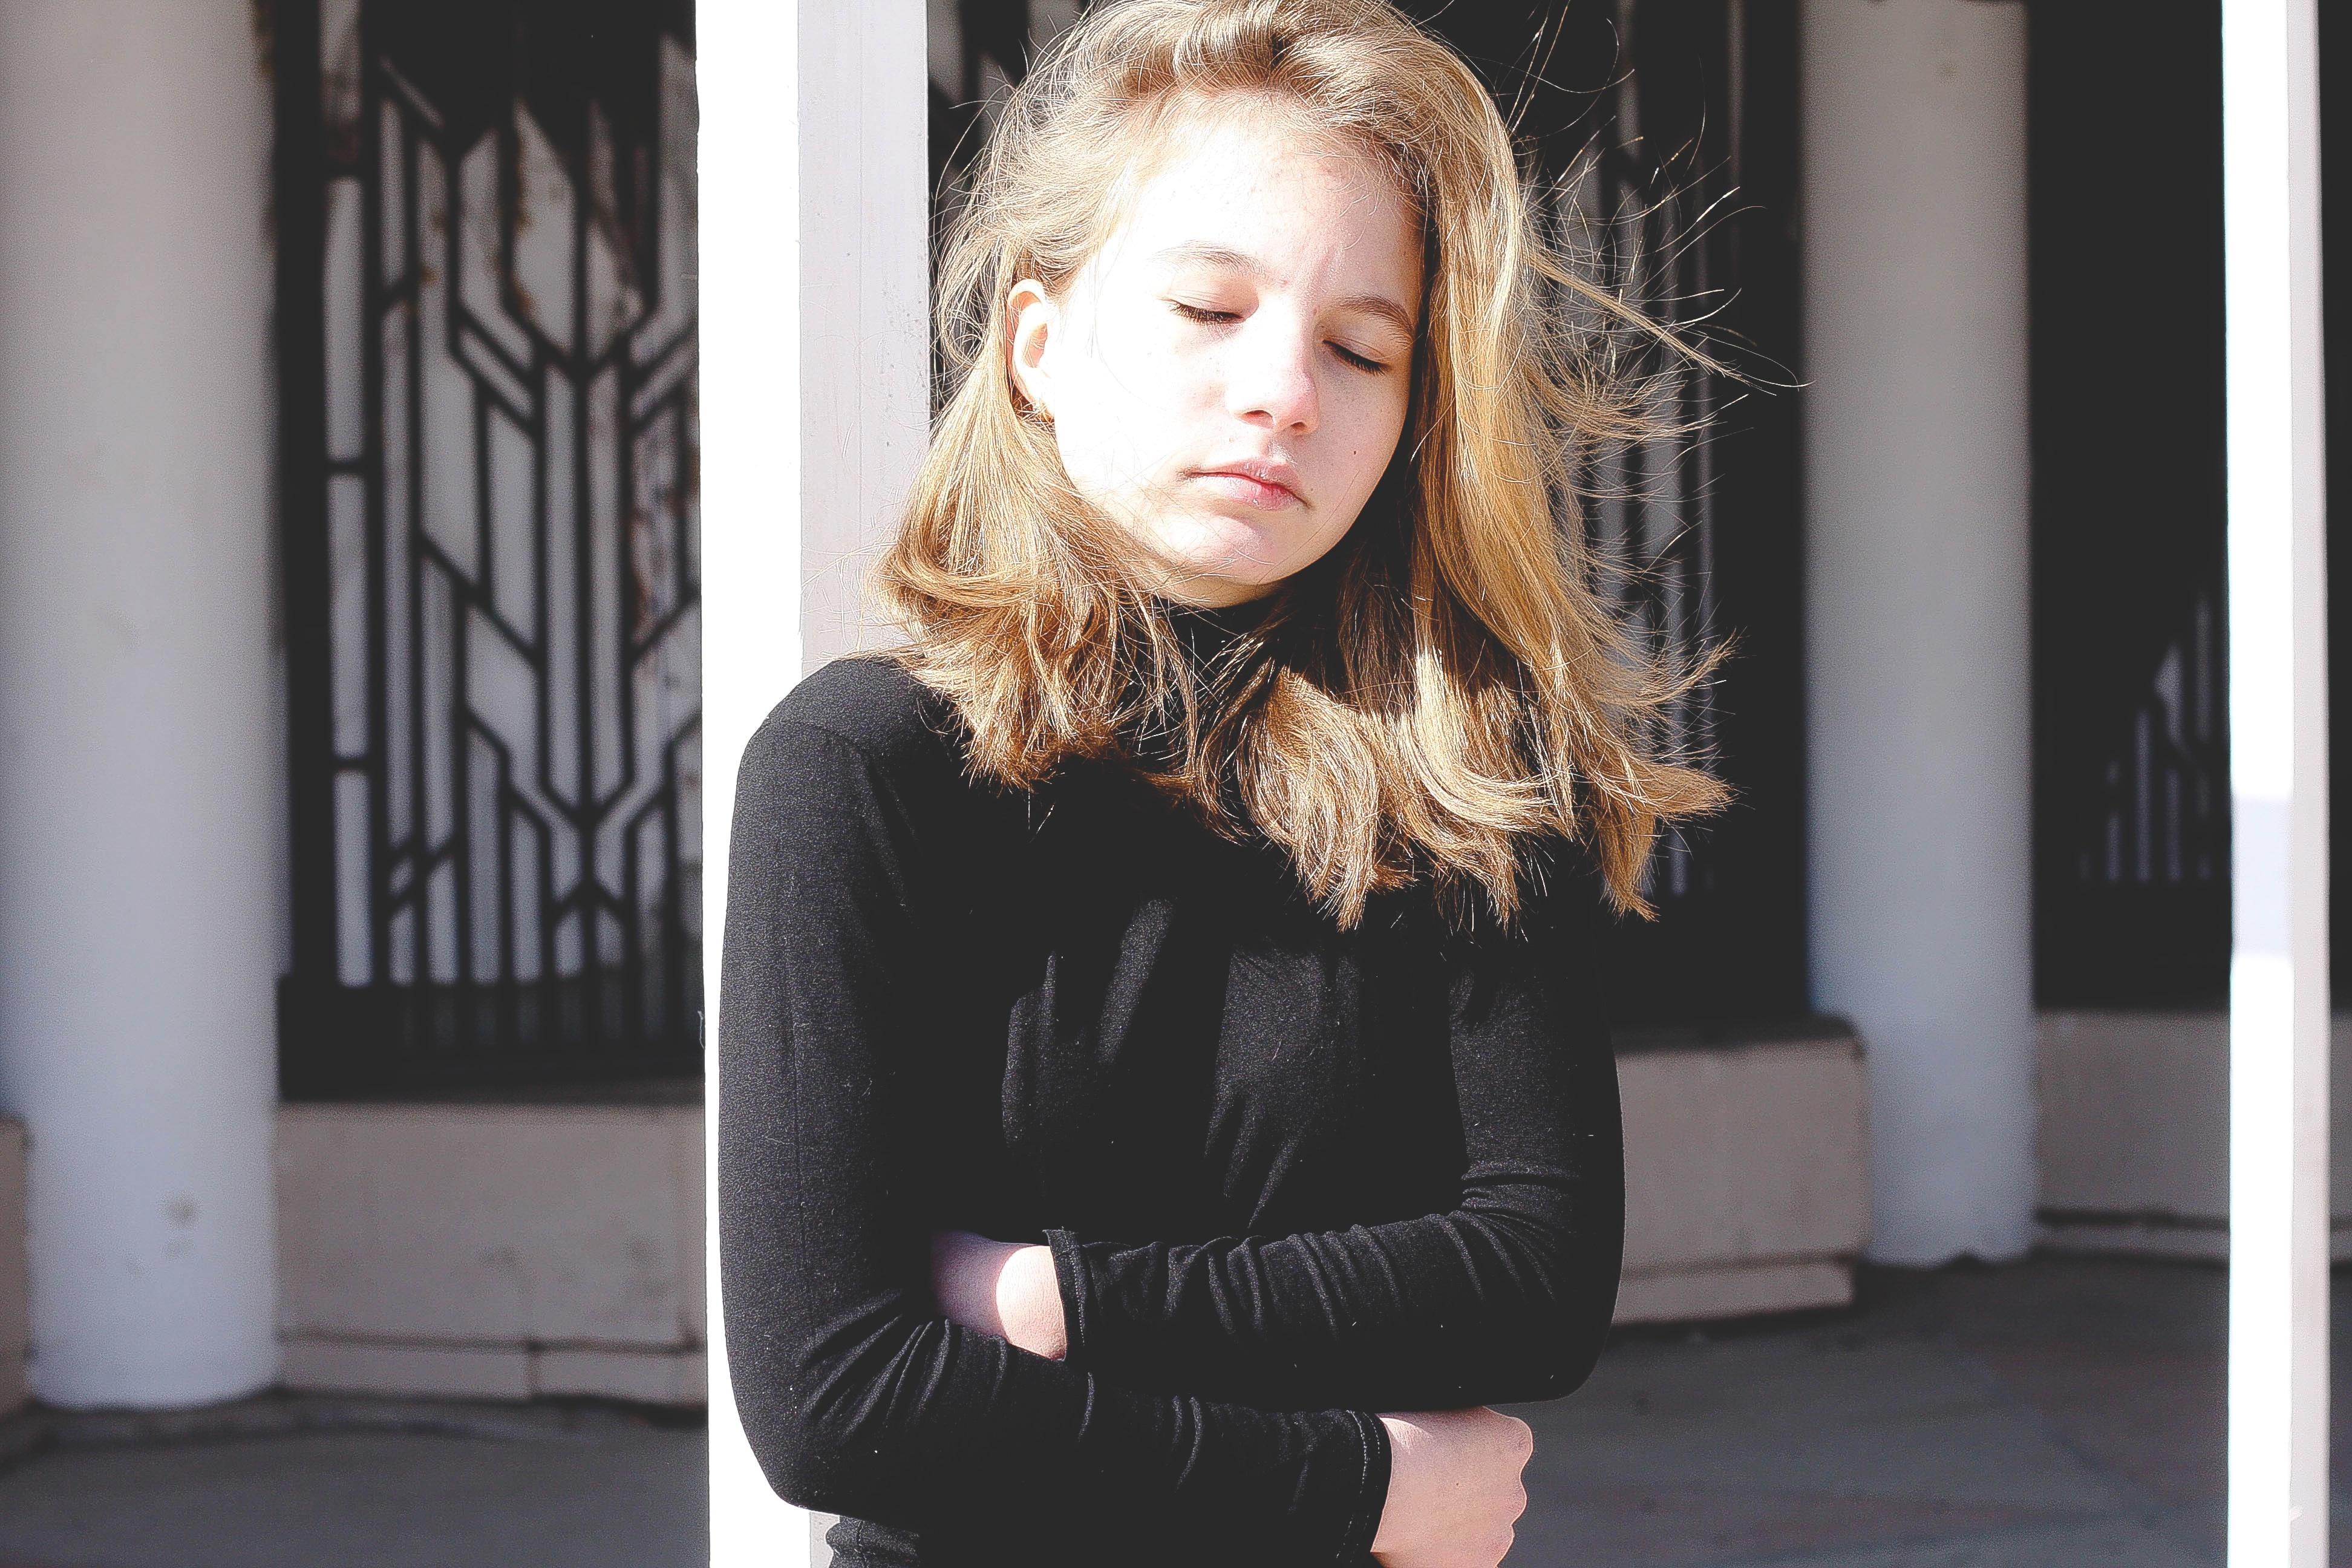 vlasy Model jar móda odevy čierna vrchné odevy účes dlhé vlasy šaty krása  blond fotenie hnedé 13fbc9f47bb